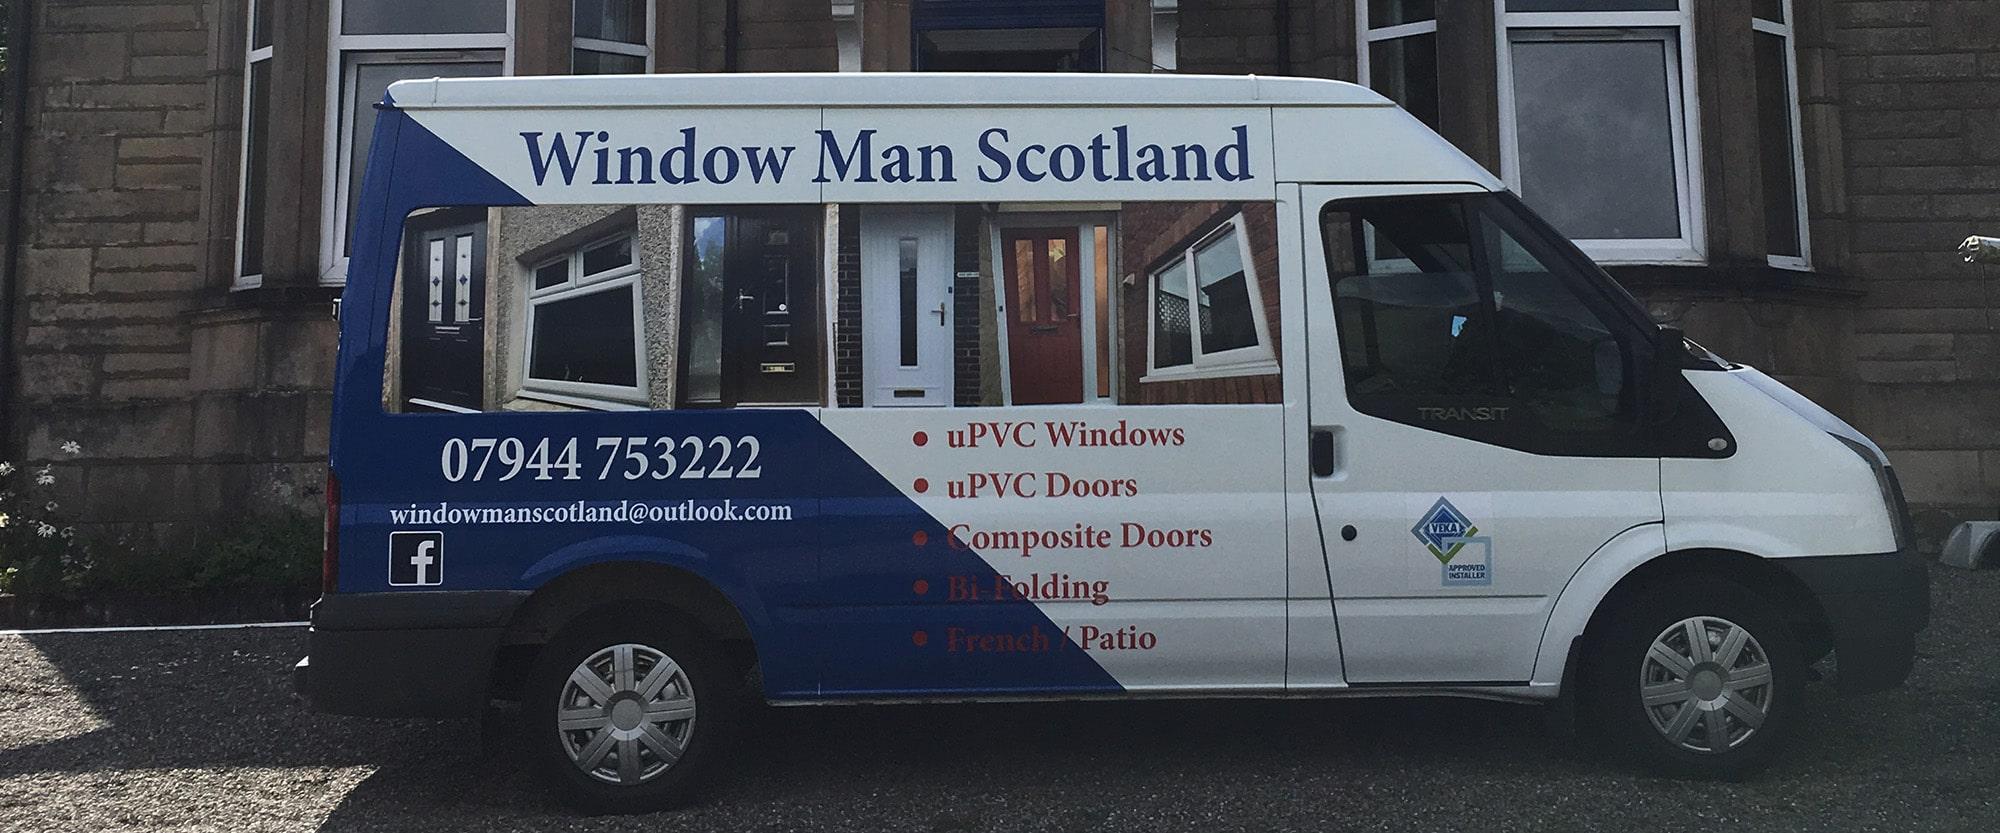 Windowman Scotland